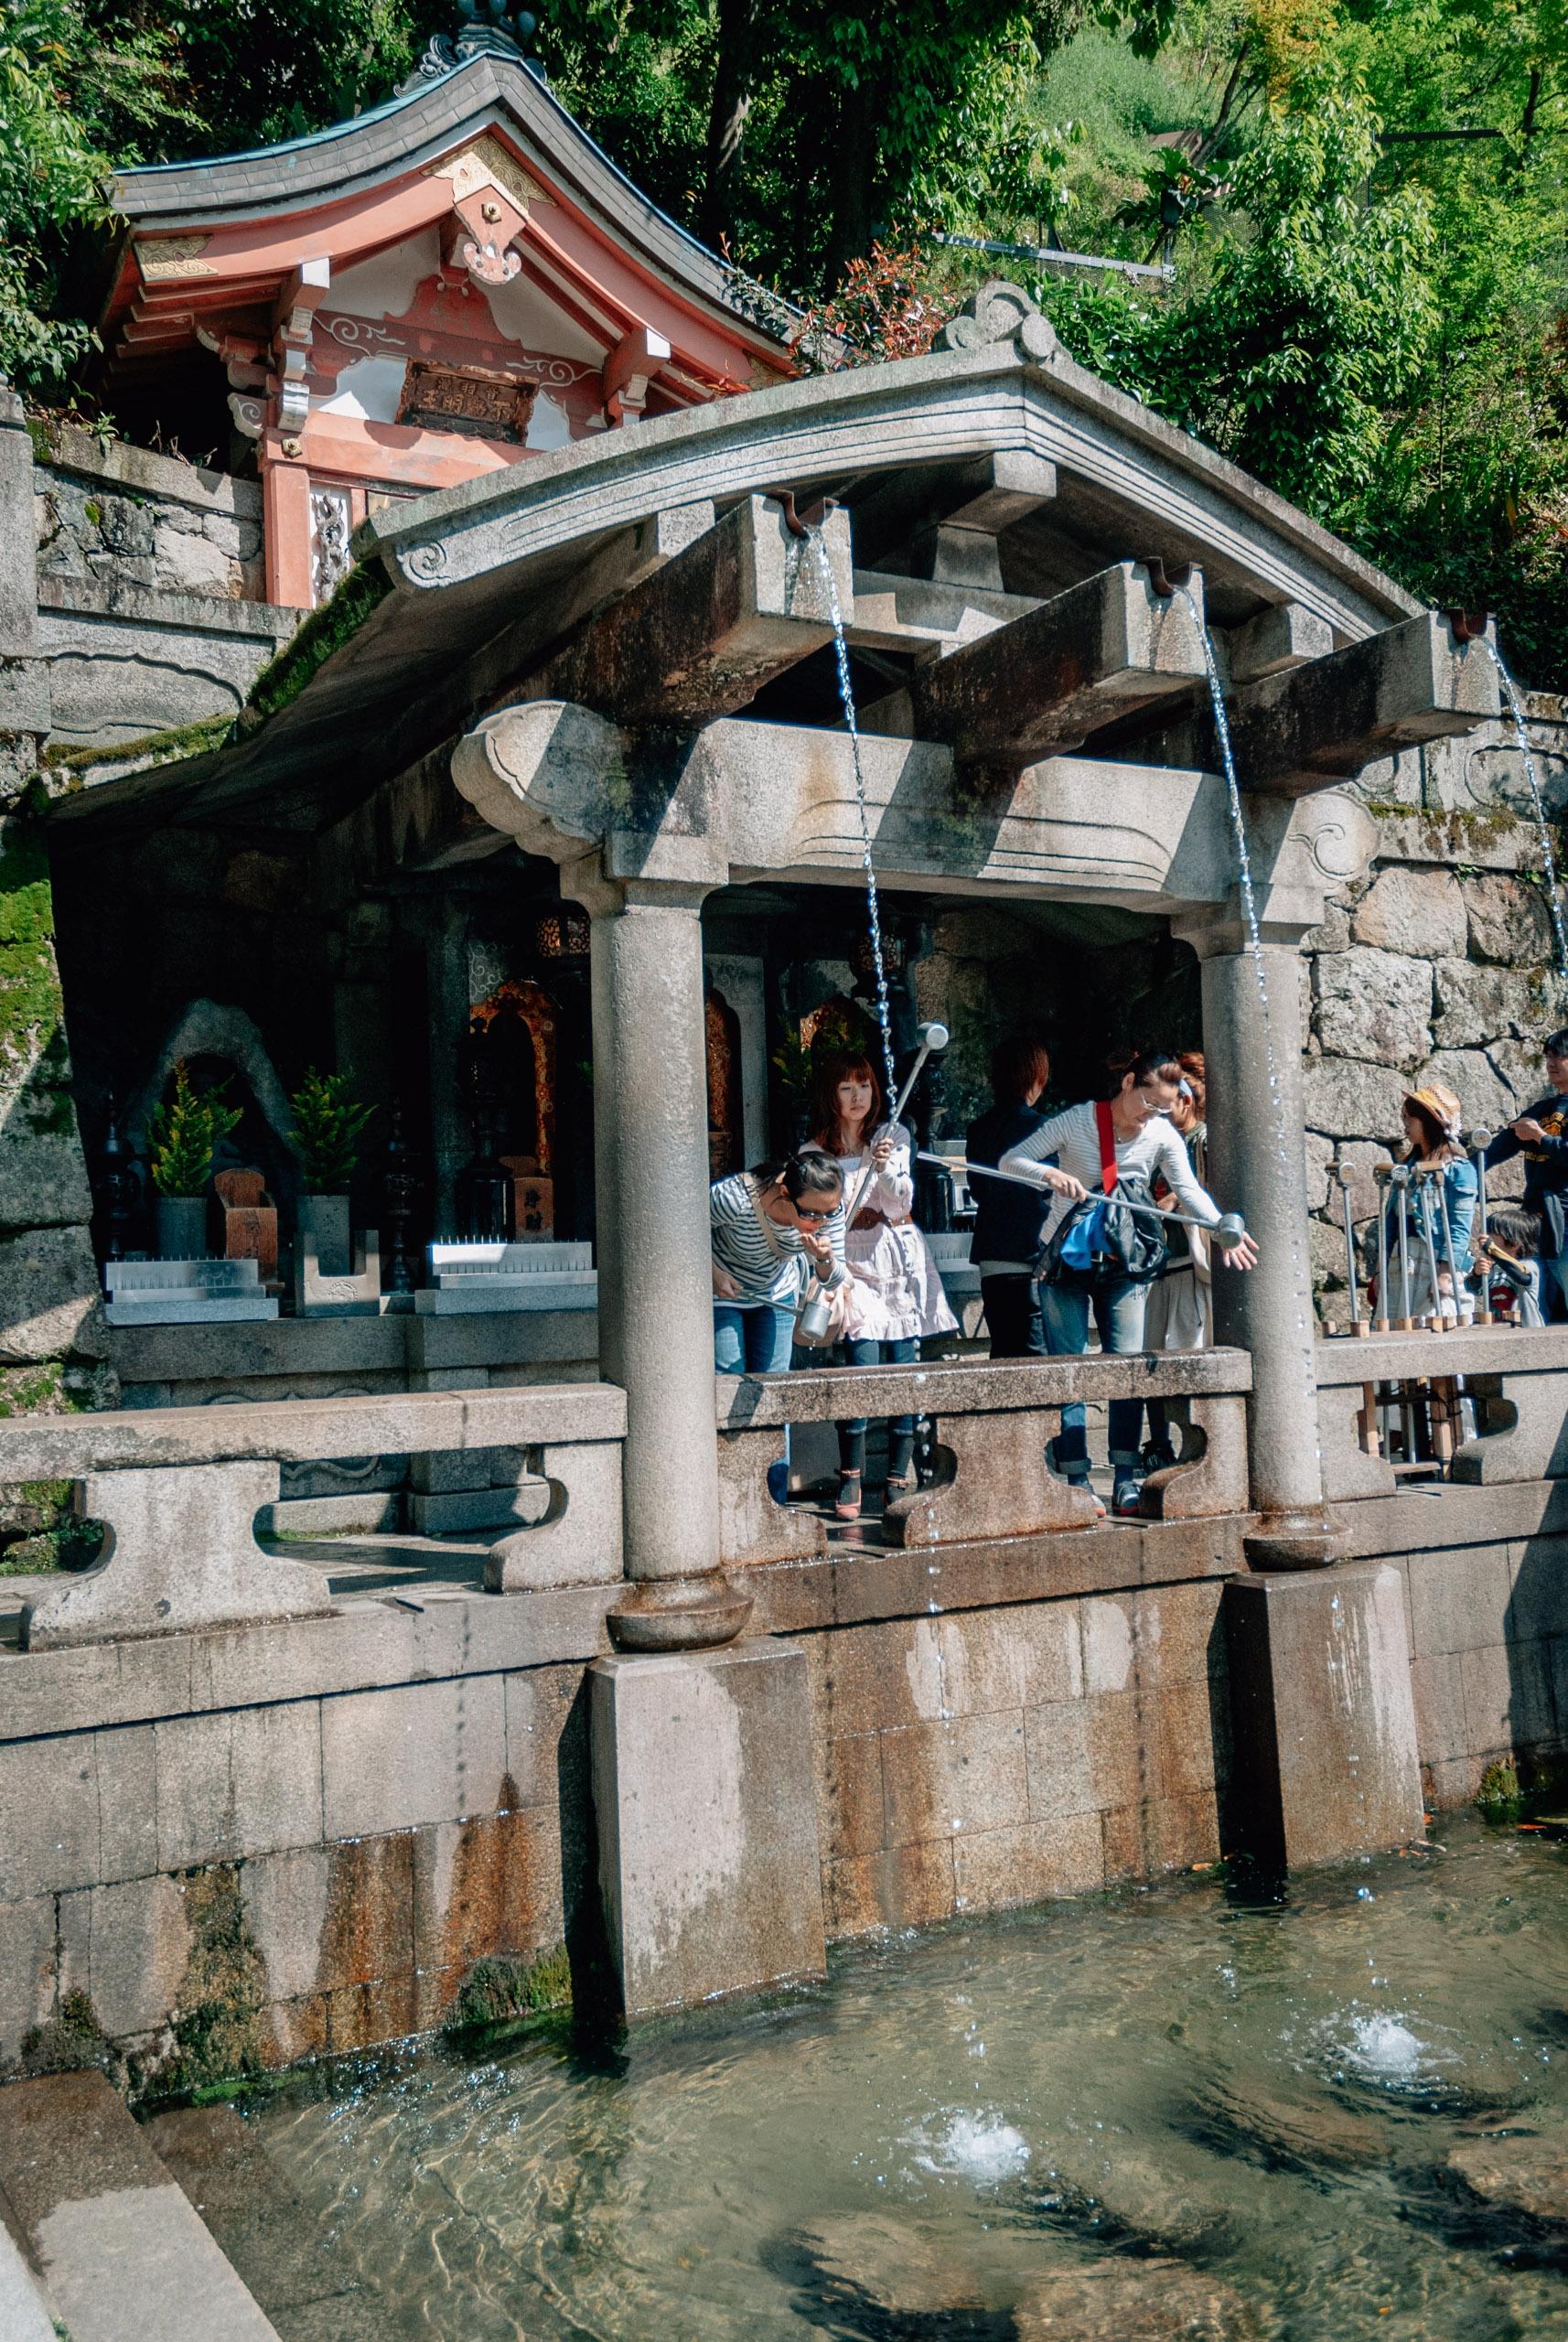 Japan - Tokyo Kyoto & Nikko - 2010-0426-DSC_0072_116621